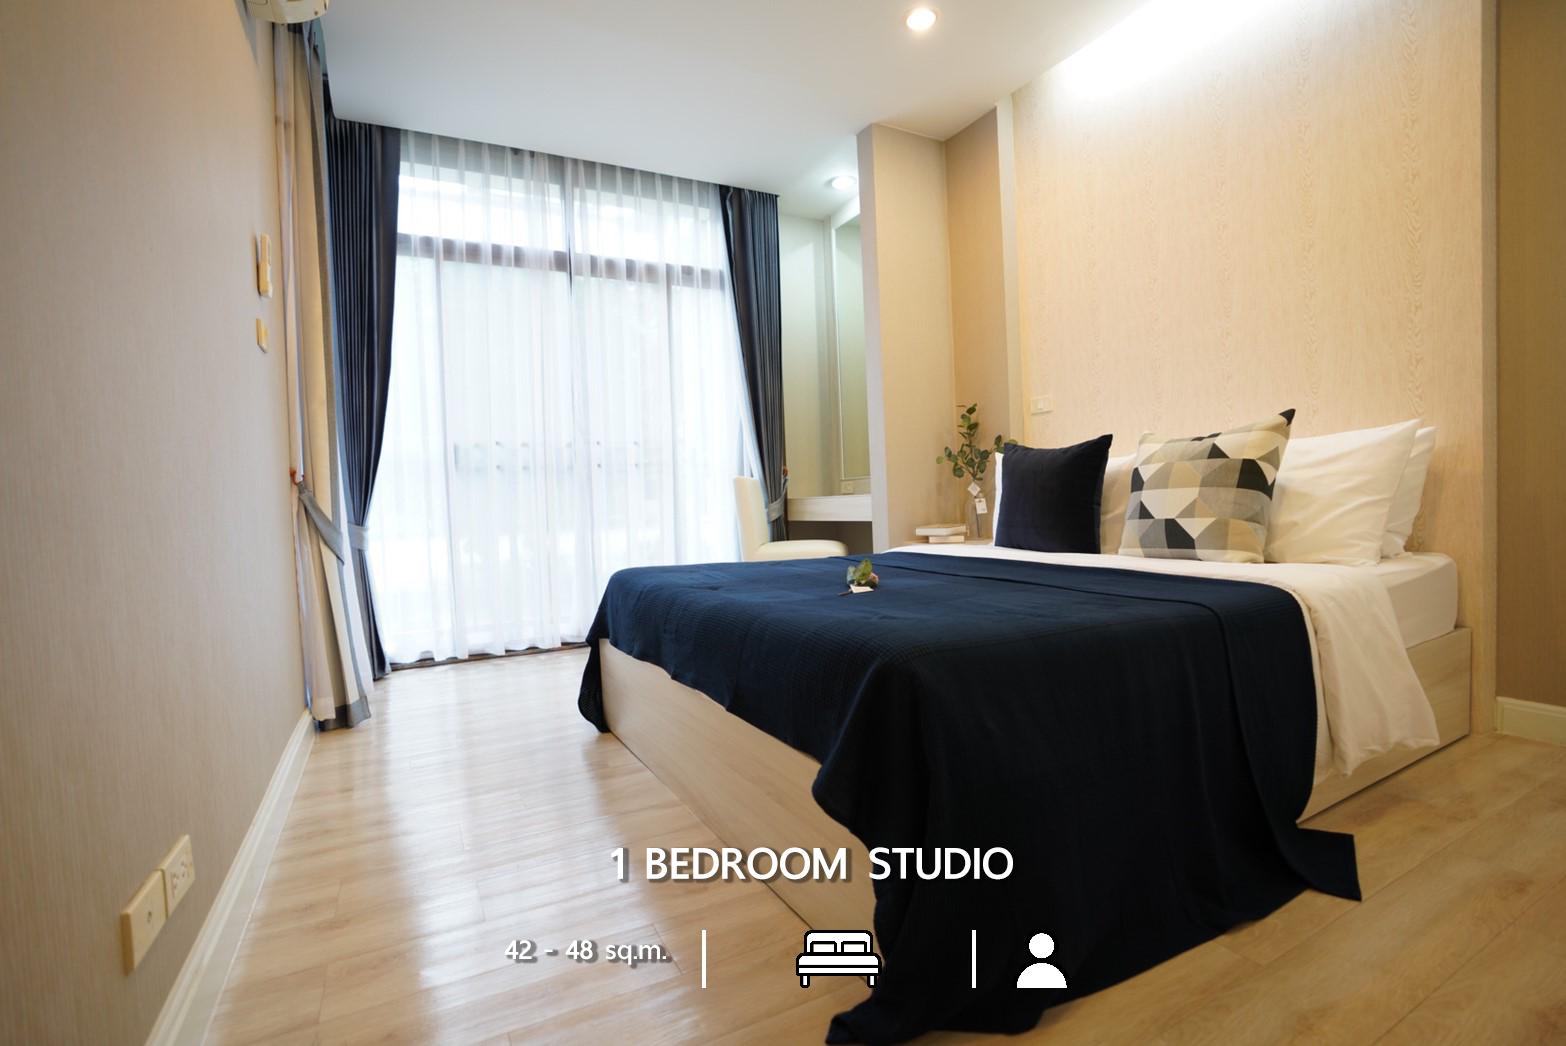 1 Bedroom Studio Sunshine Sriracha Hotel & Service Apartment